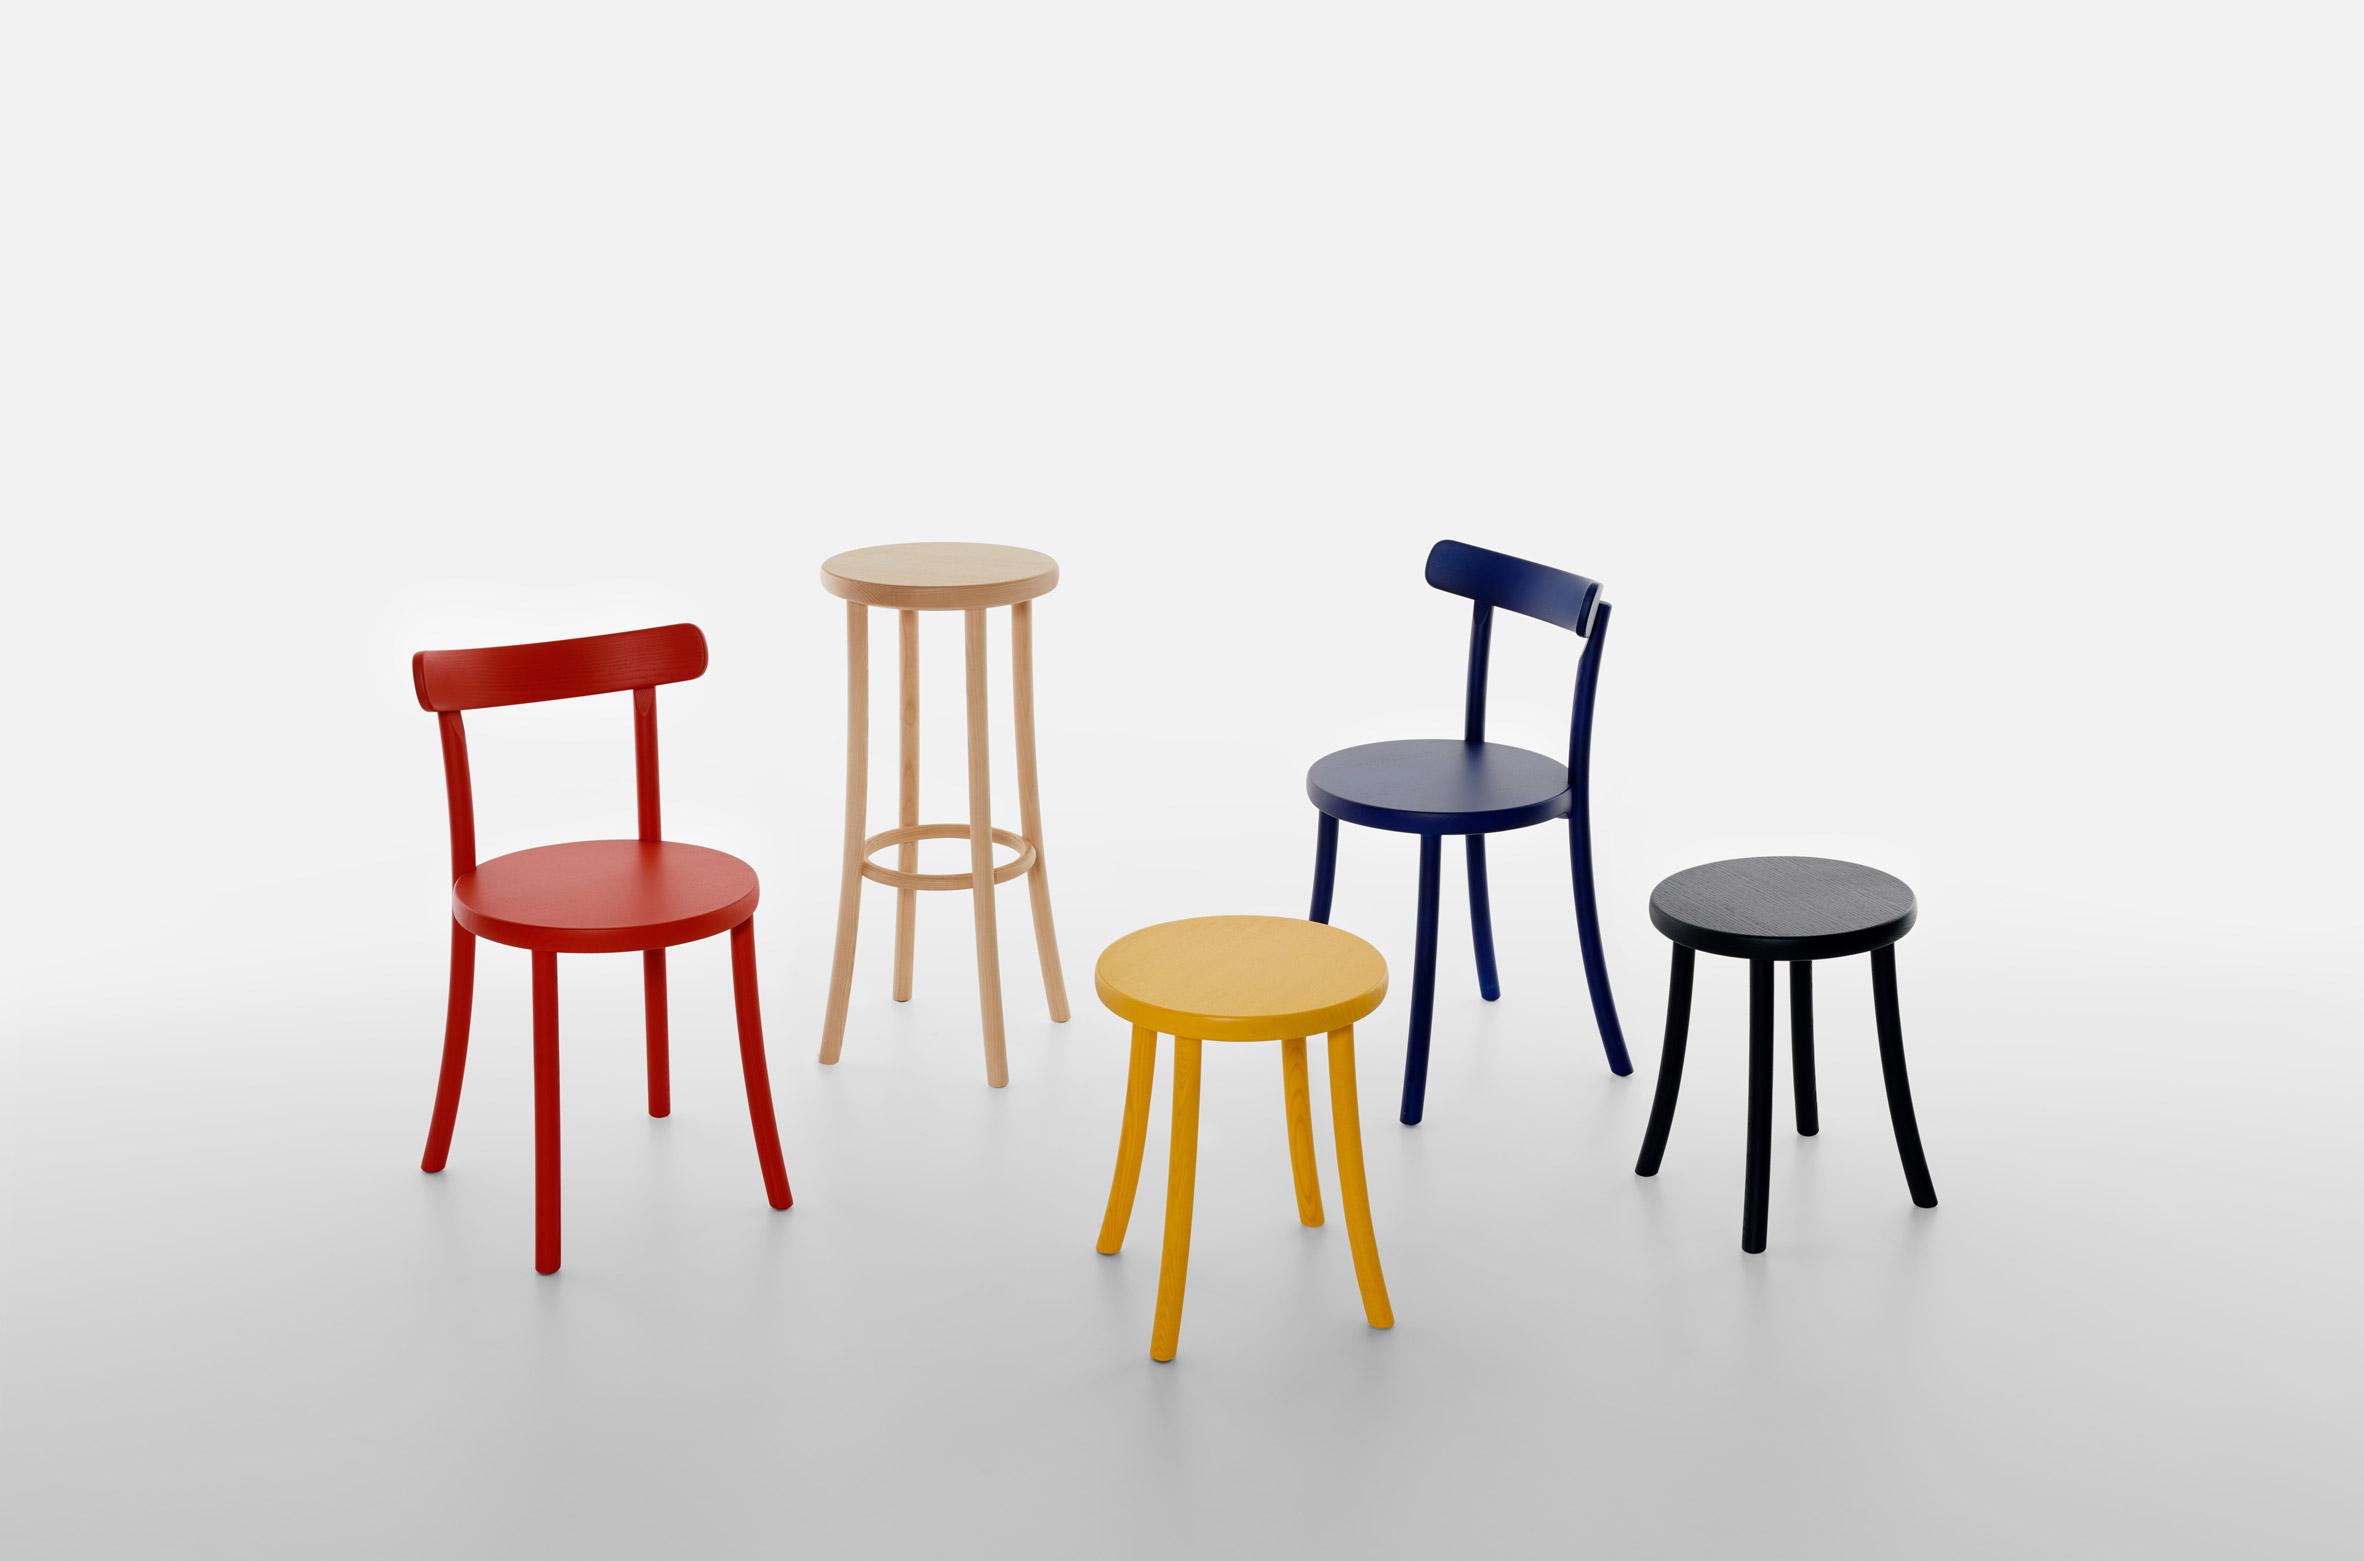 Zampa chairs and stools by Jasper Morrison for Mattiazzi